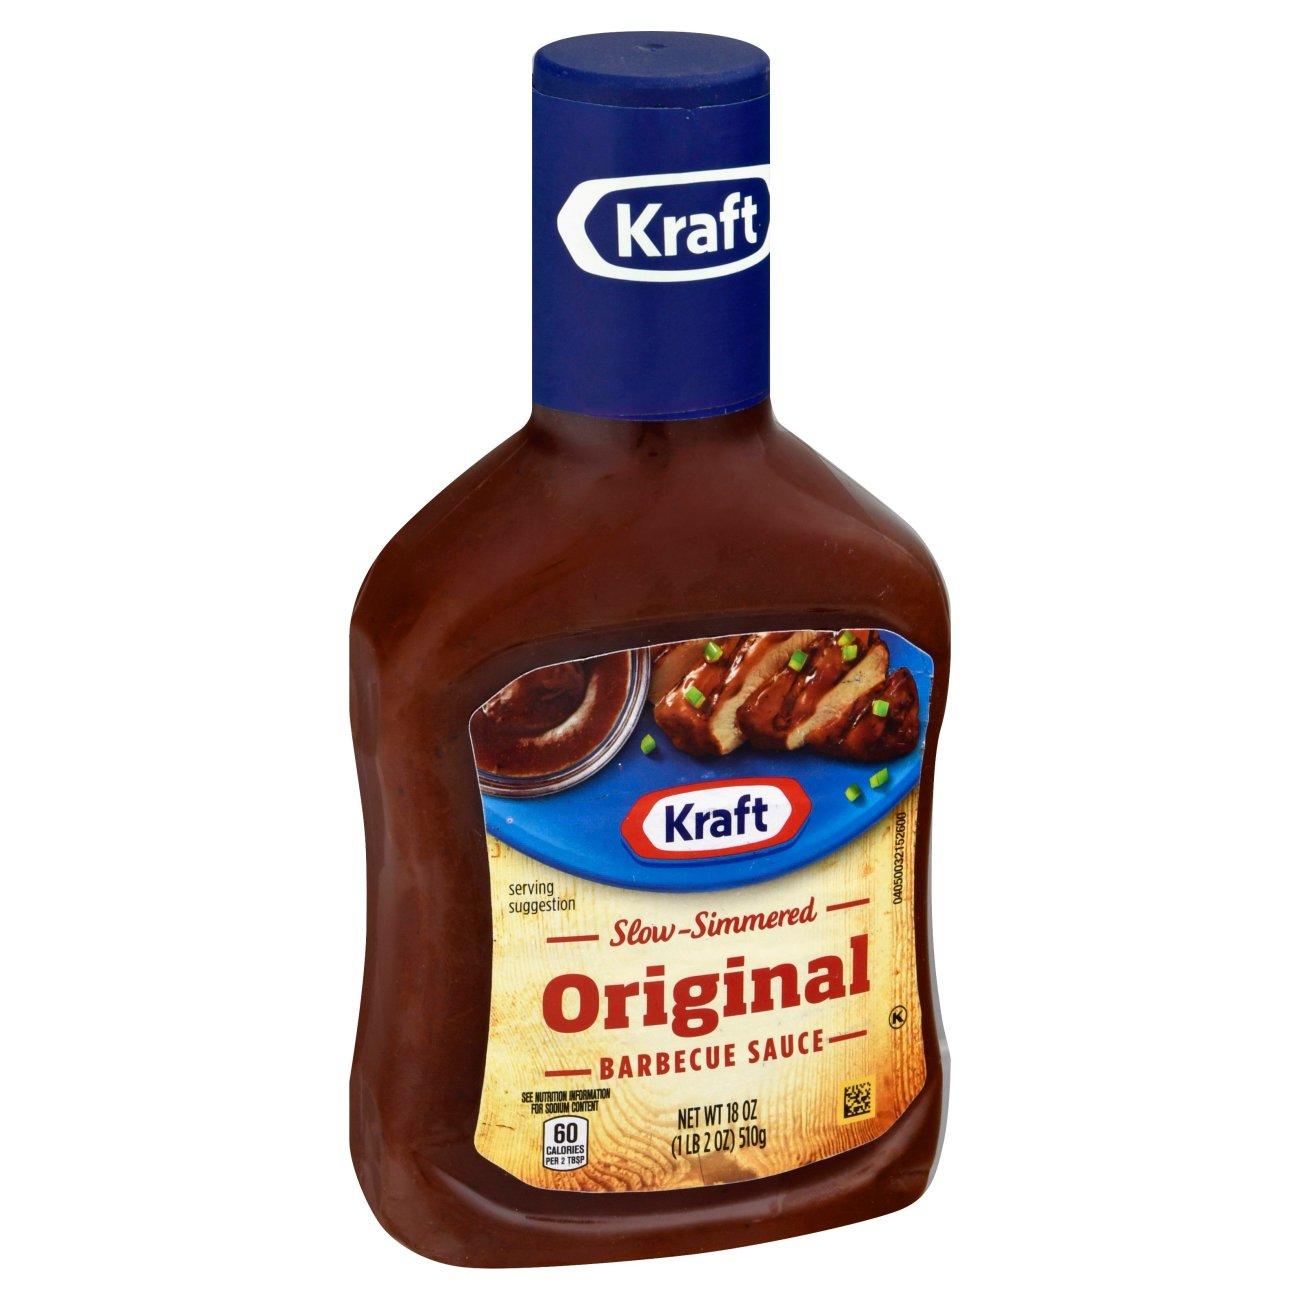 Kraft Original Bbq Sauce Shop Barbecue Sauces At H E B